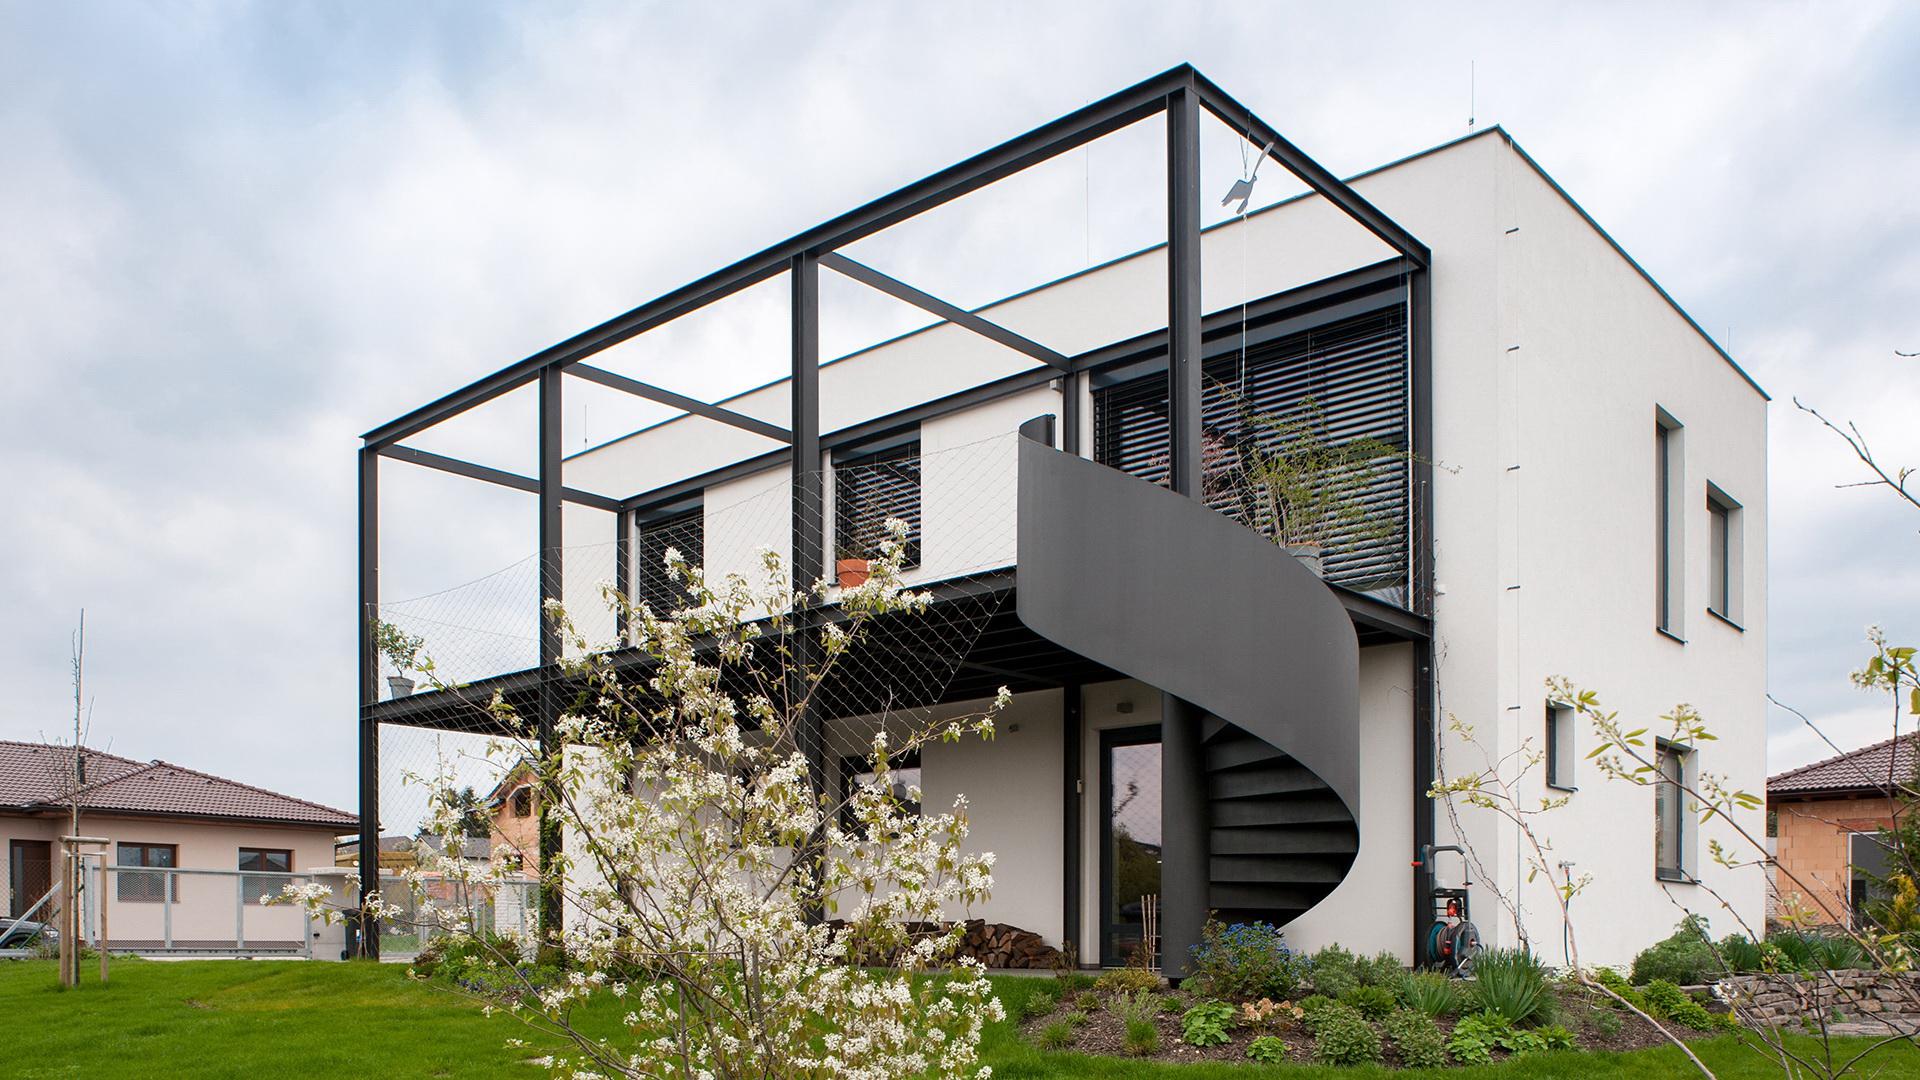 Family home with a garage   - Family home with a garage